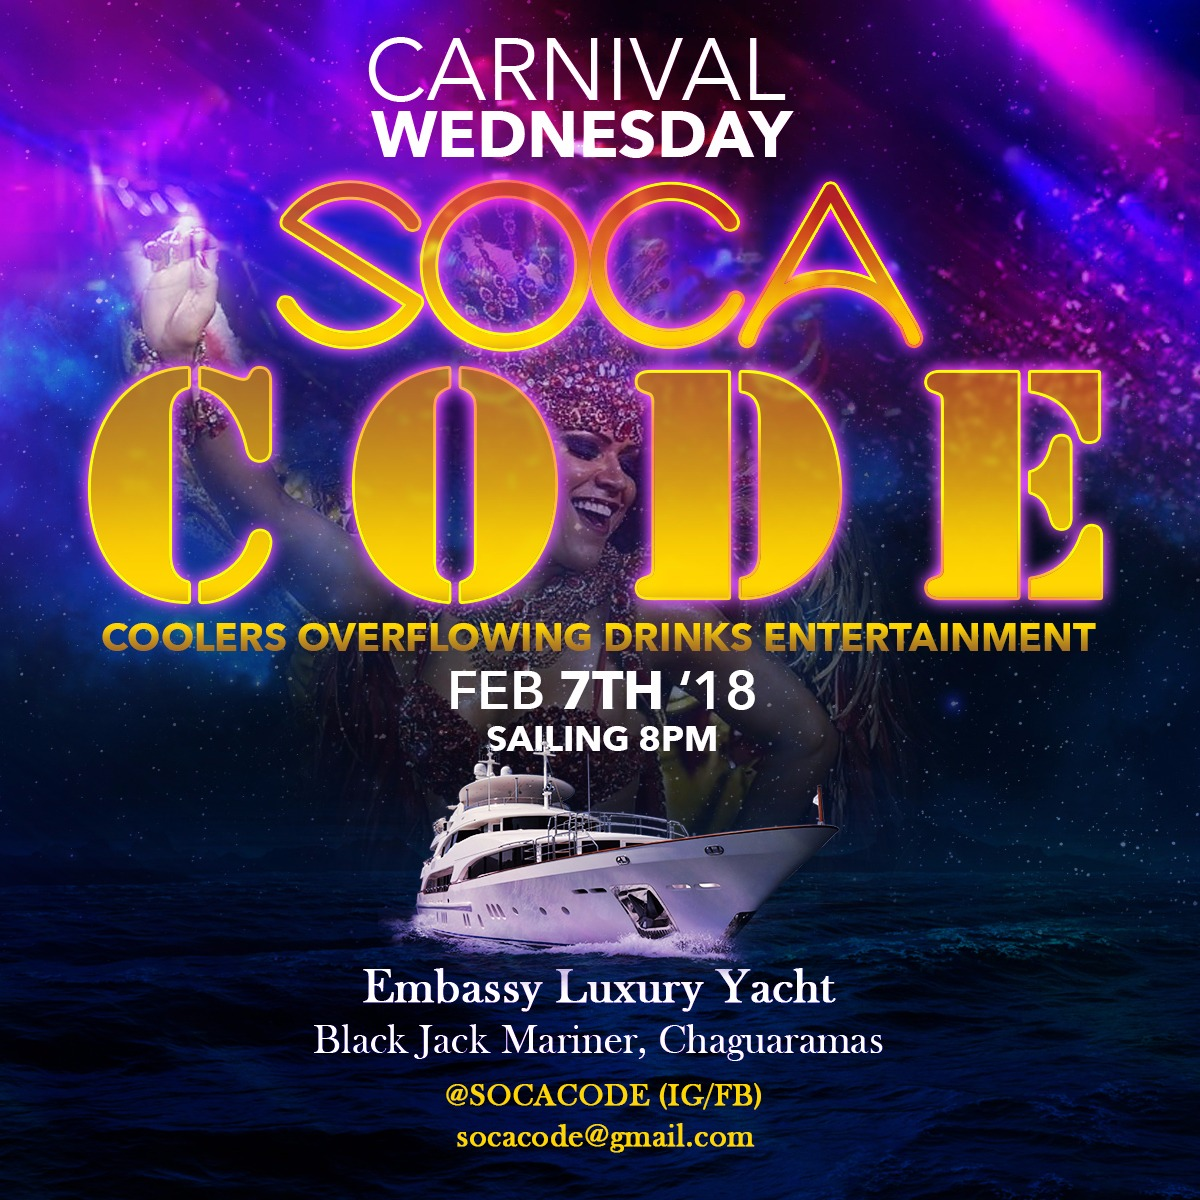 Soca Code - Cooler Cruise